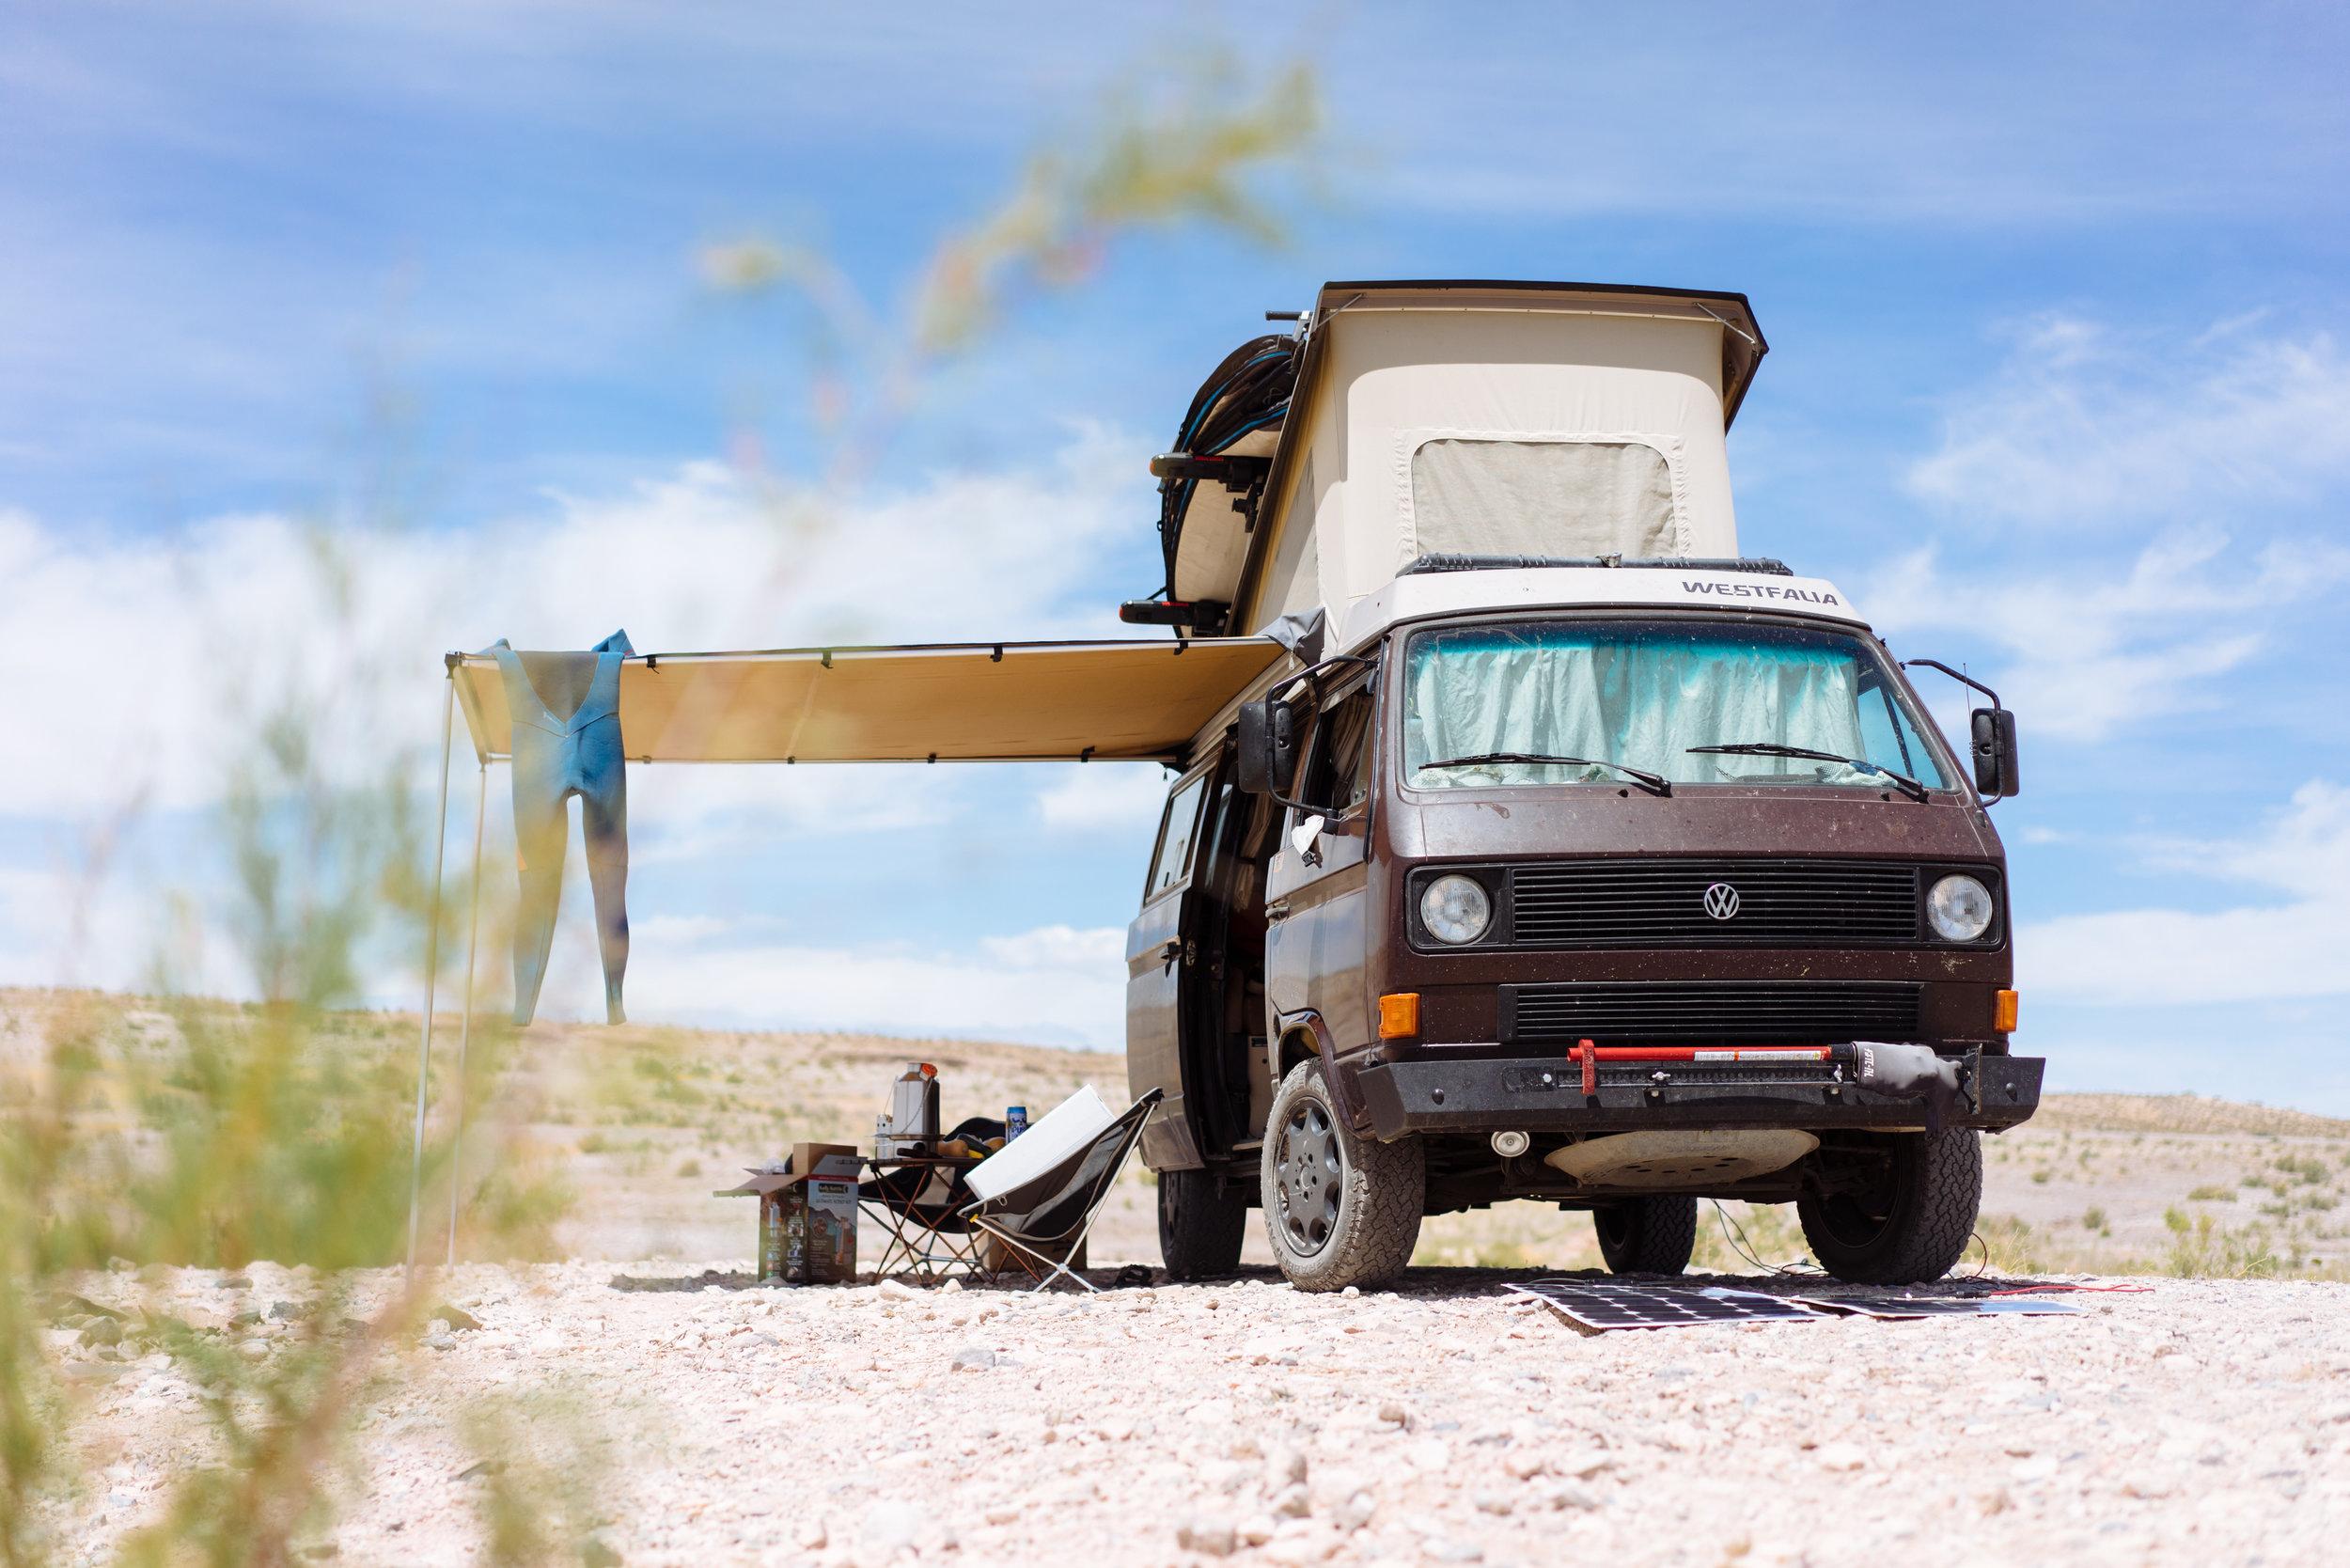 Camp set up on Lake Mead, NV